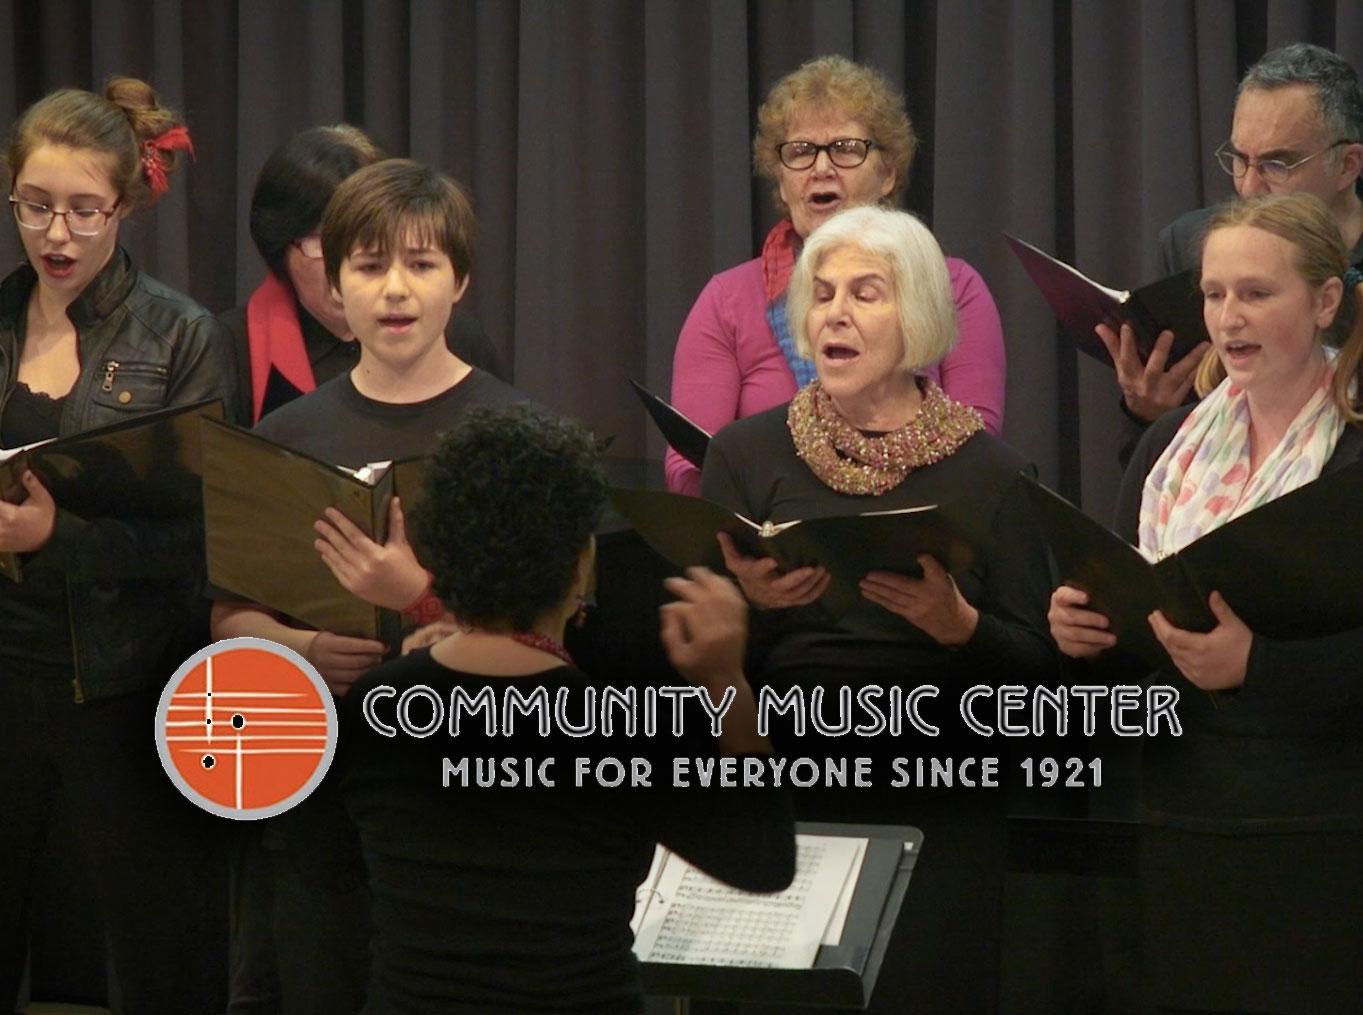 SF Community Music Center